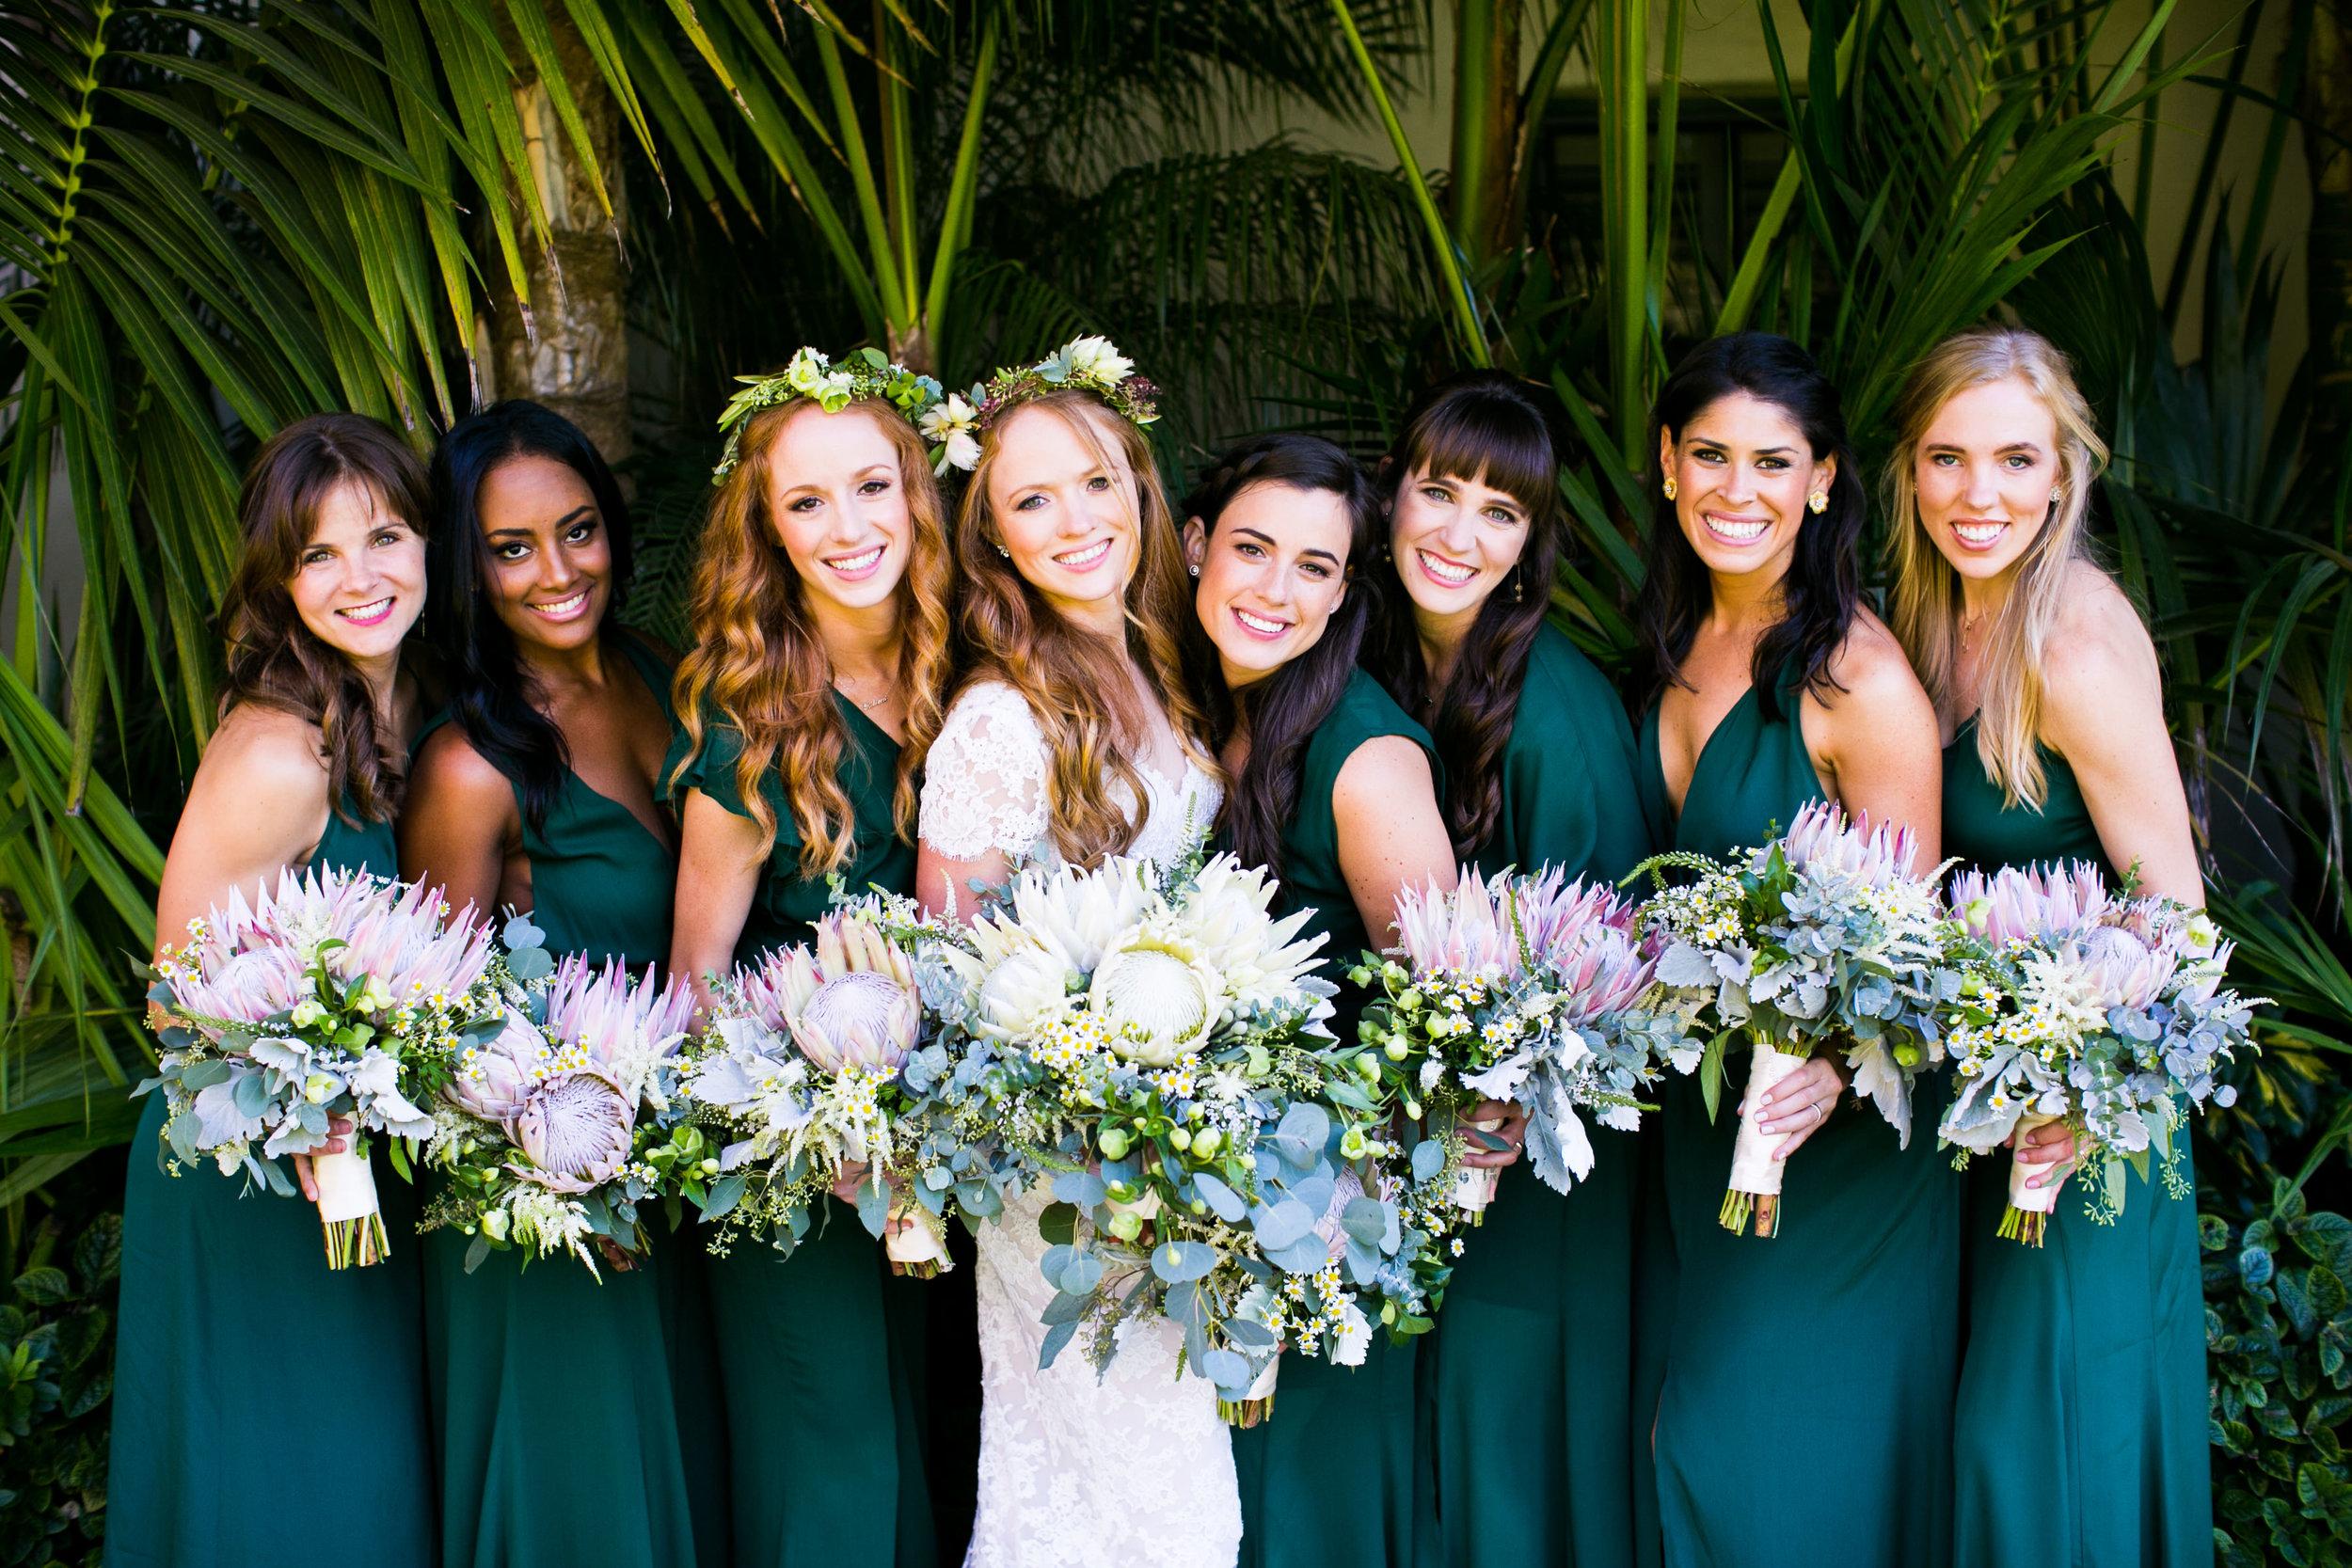 www.santabarbarawedding.com   Four Seasons Santa Barbara   Levine Fox Events   Callaway Gable Photo   Bridesmaids